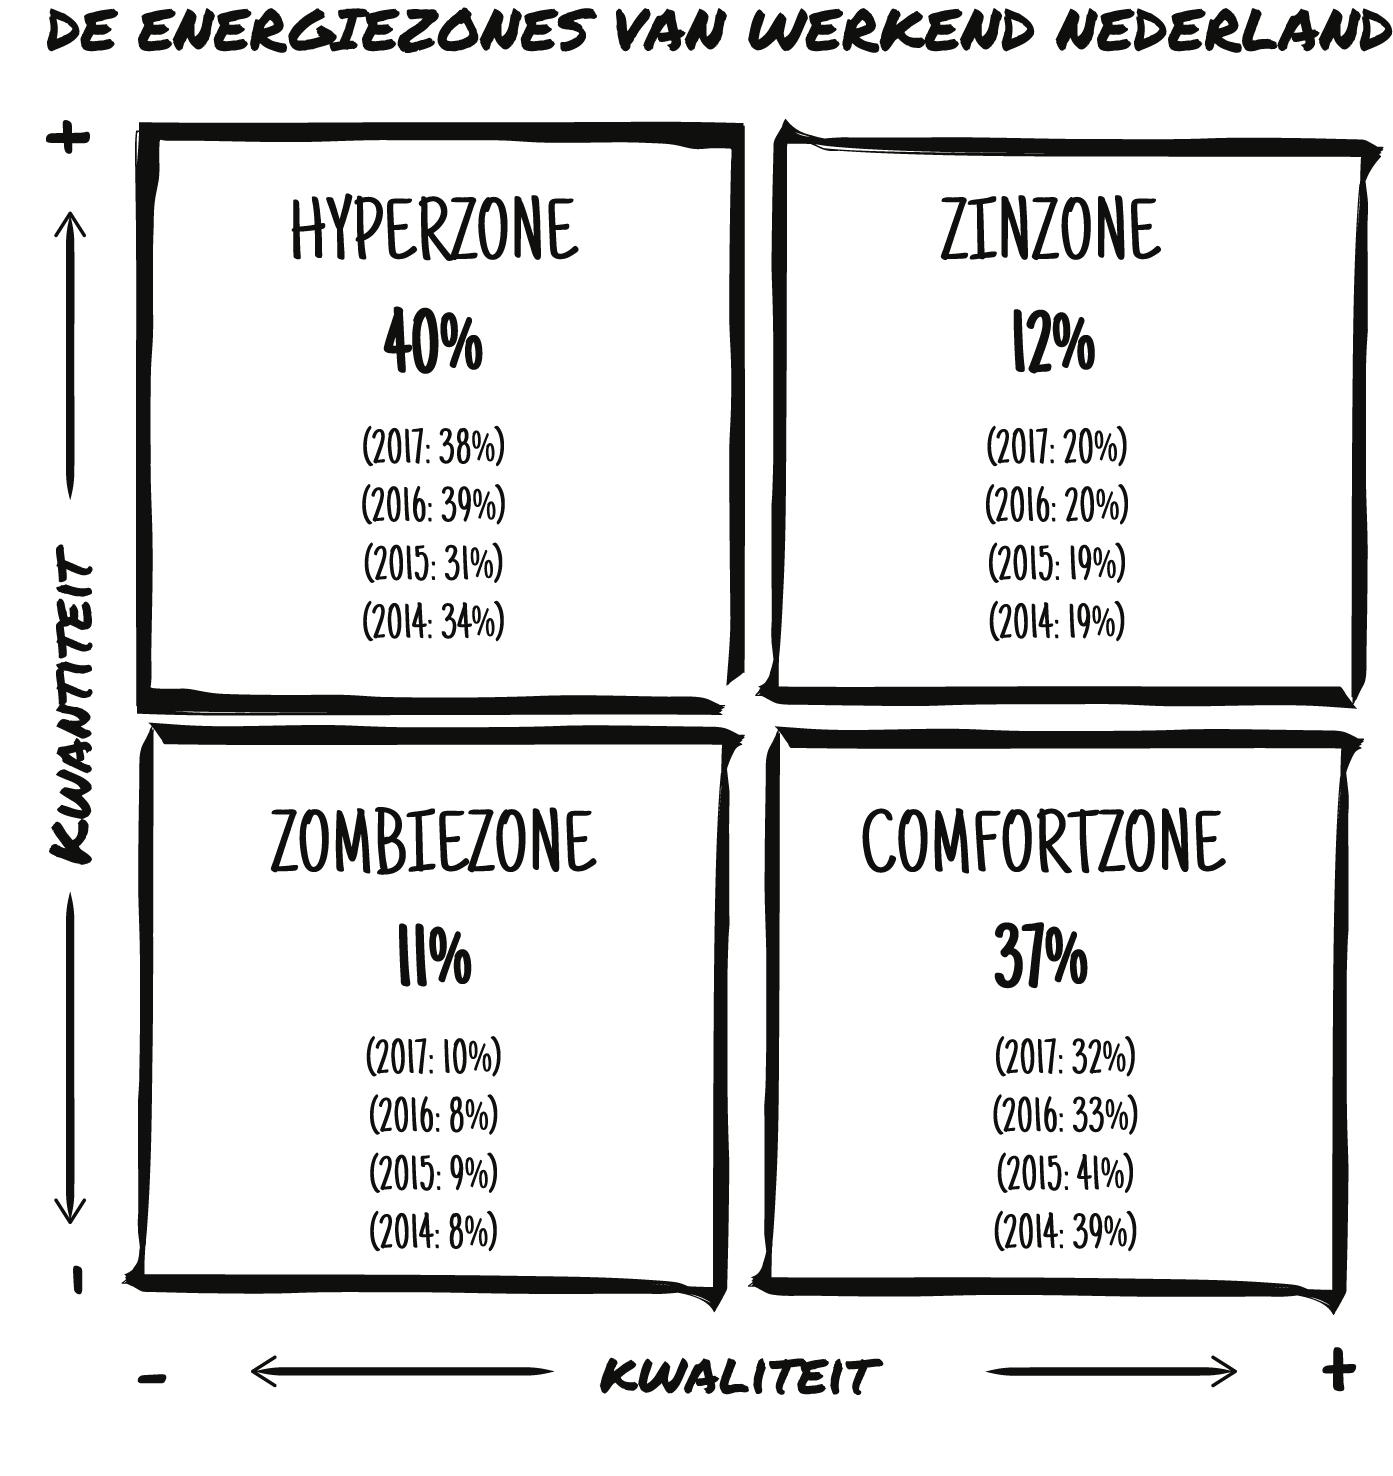 werkvuur energiezones hyperzone zinzone zombiezone comfortzone